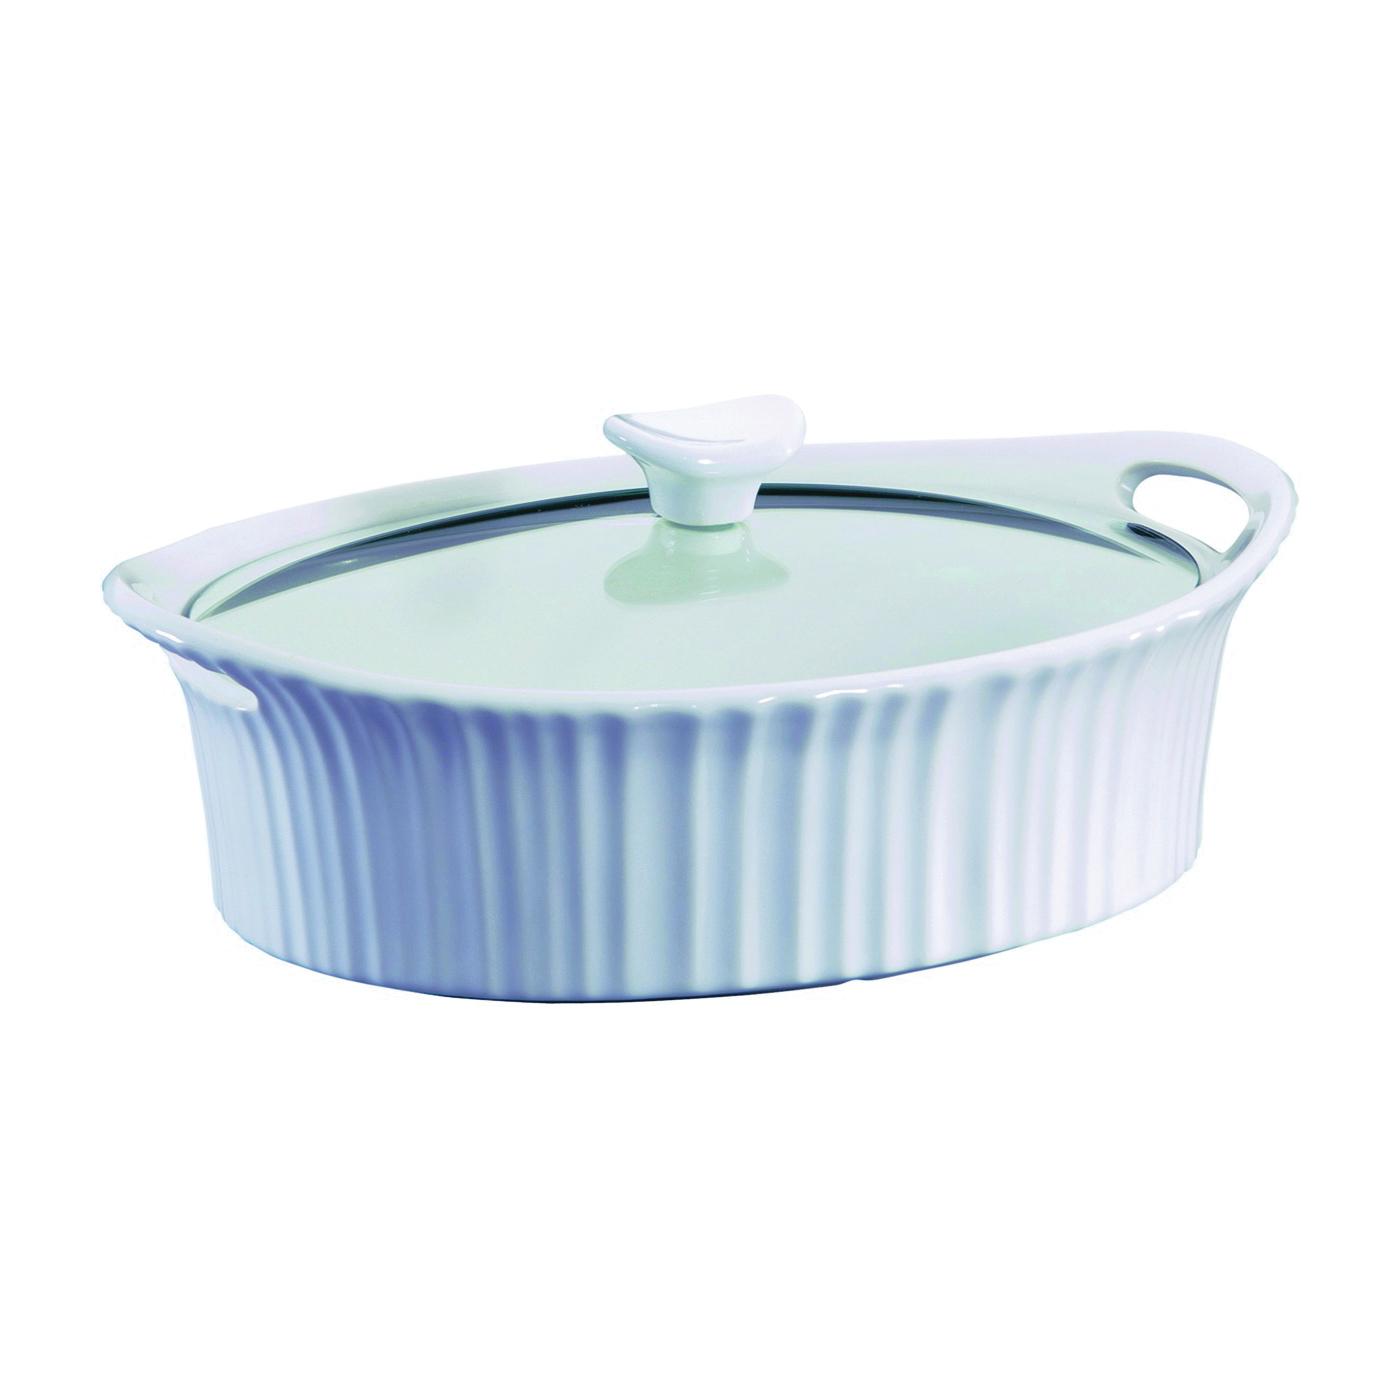 Picture of Corningware 1105935 Casserole Dish with Lid, 2.5 qt Capacity, Stoneware, French White, Dishwasher Safe: Yes